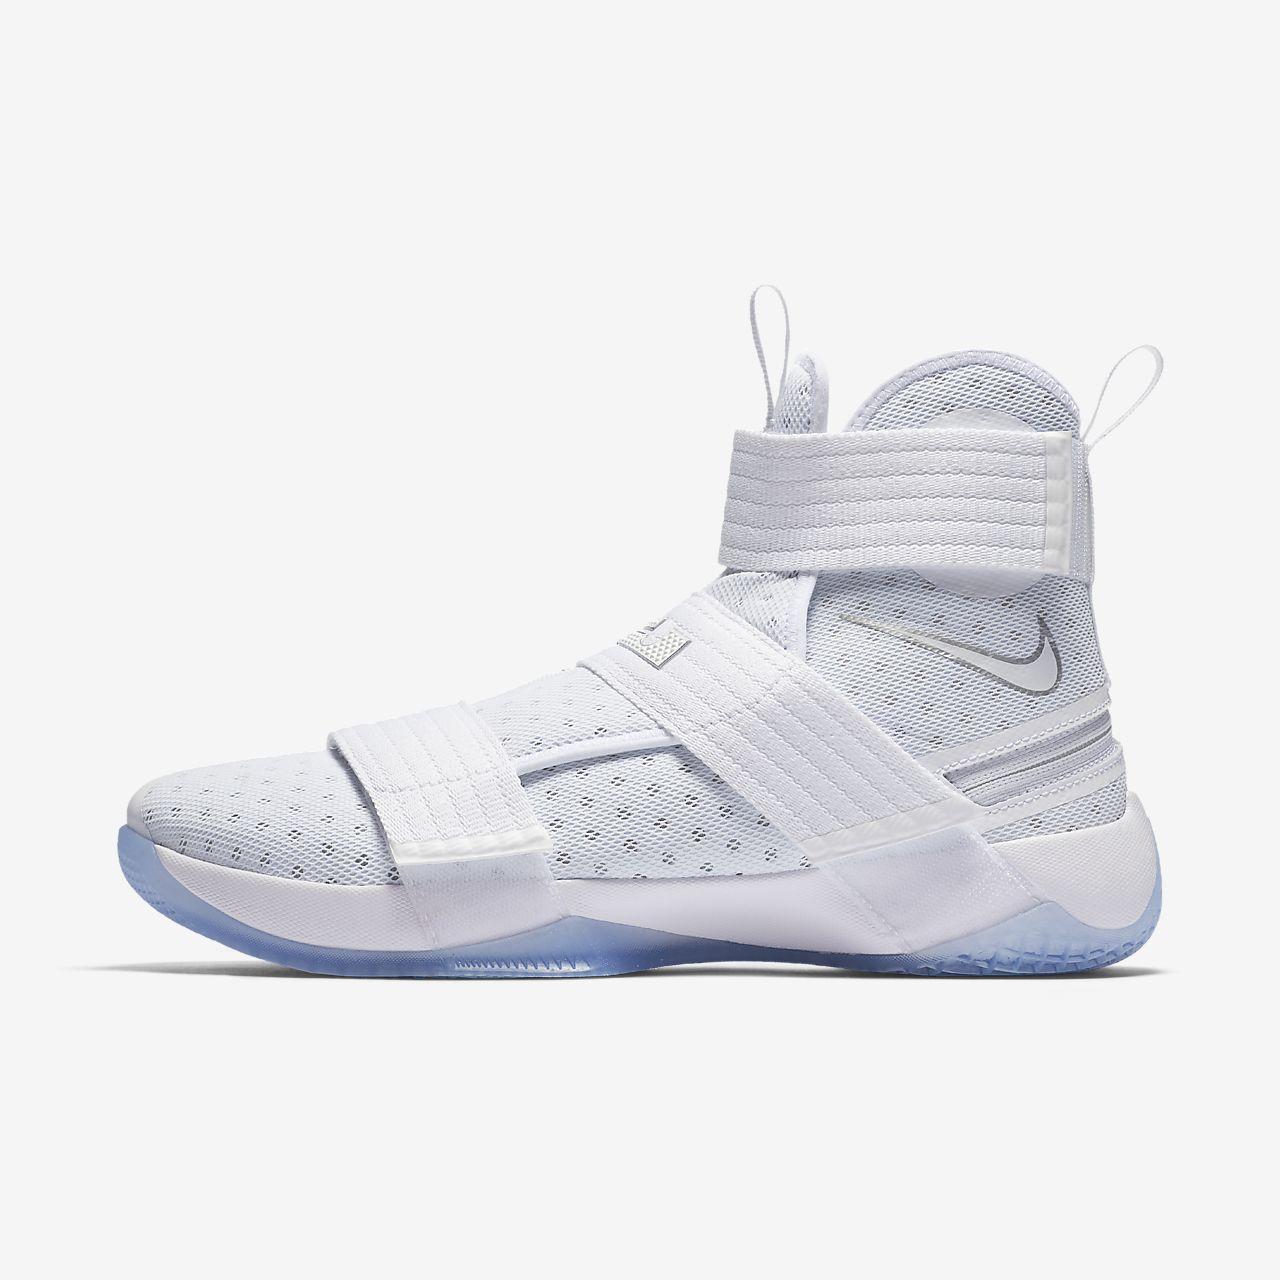 ... Nike LeBron Soldier 10 FlyEase Men\u0027s Basketball Shoe